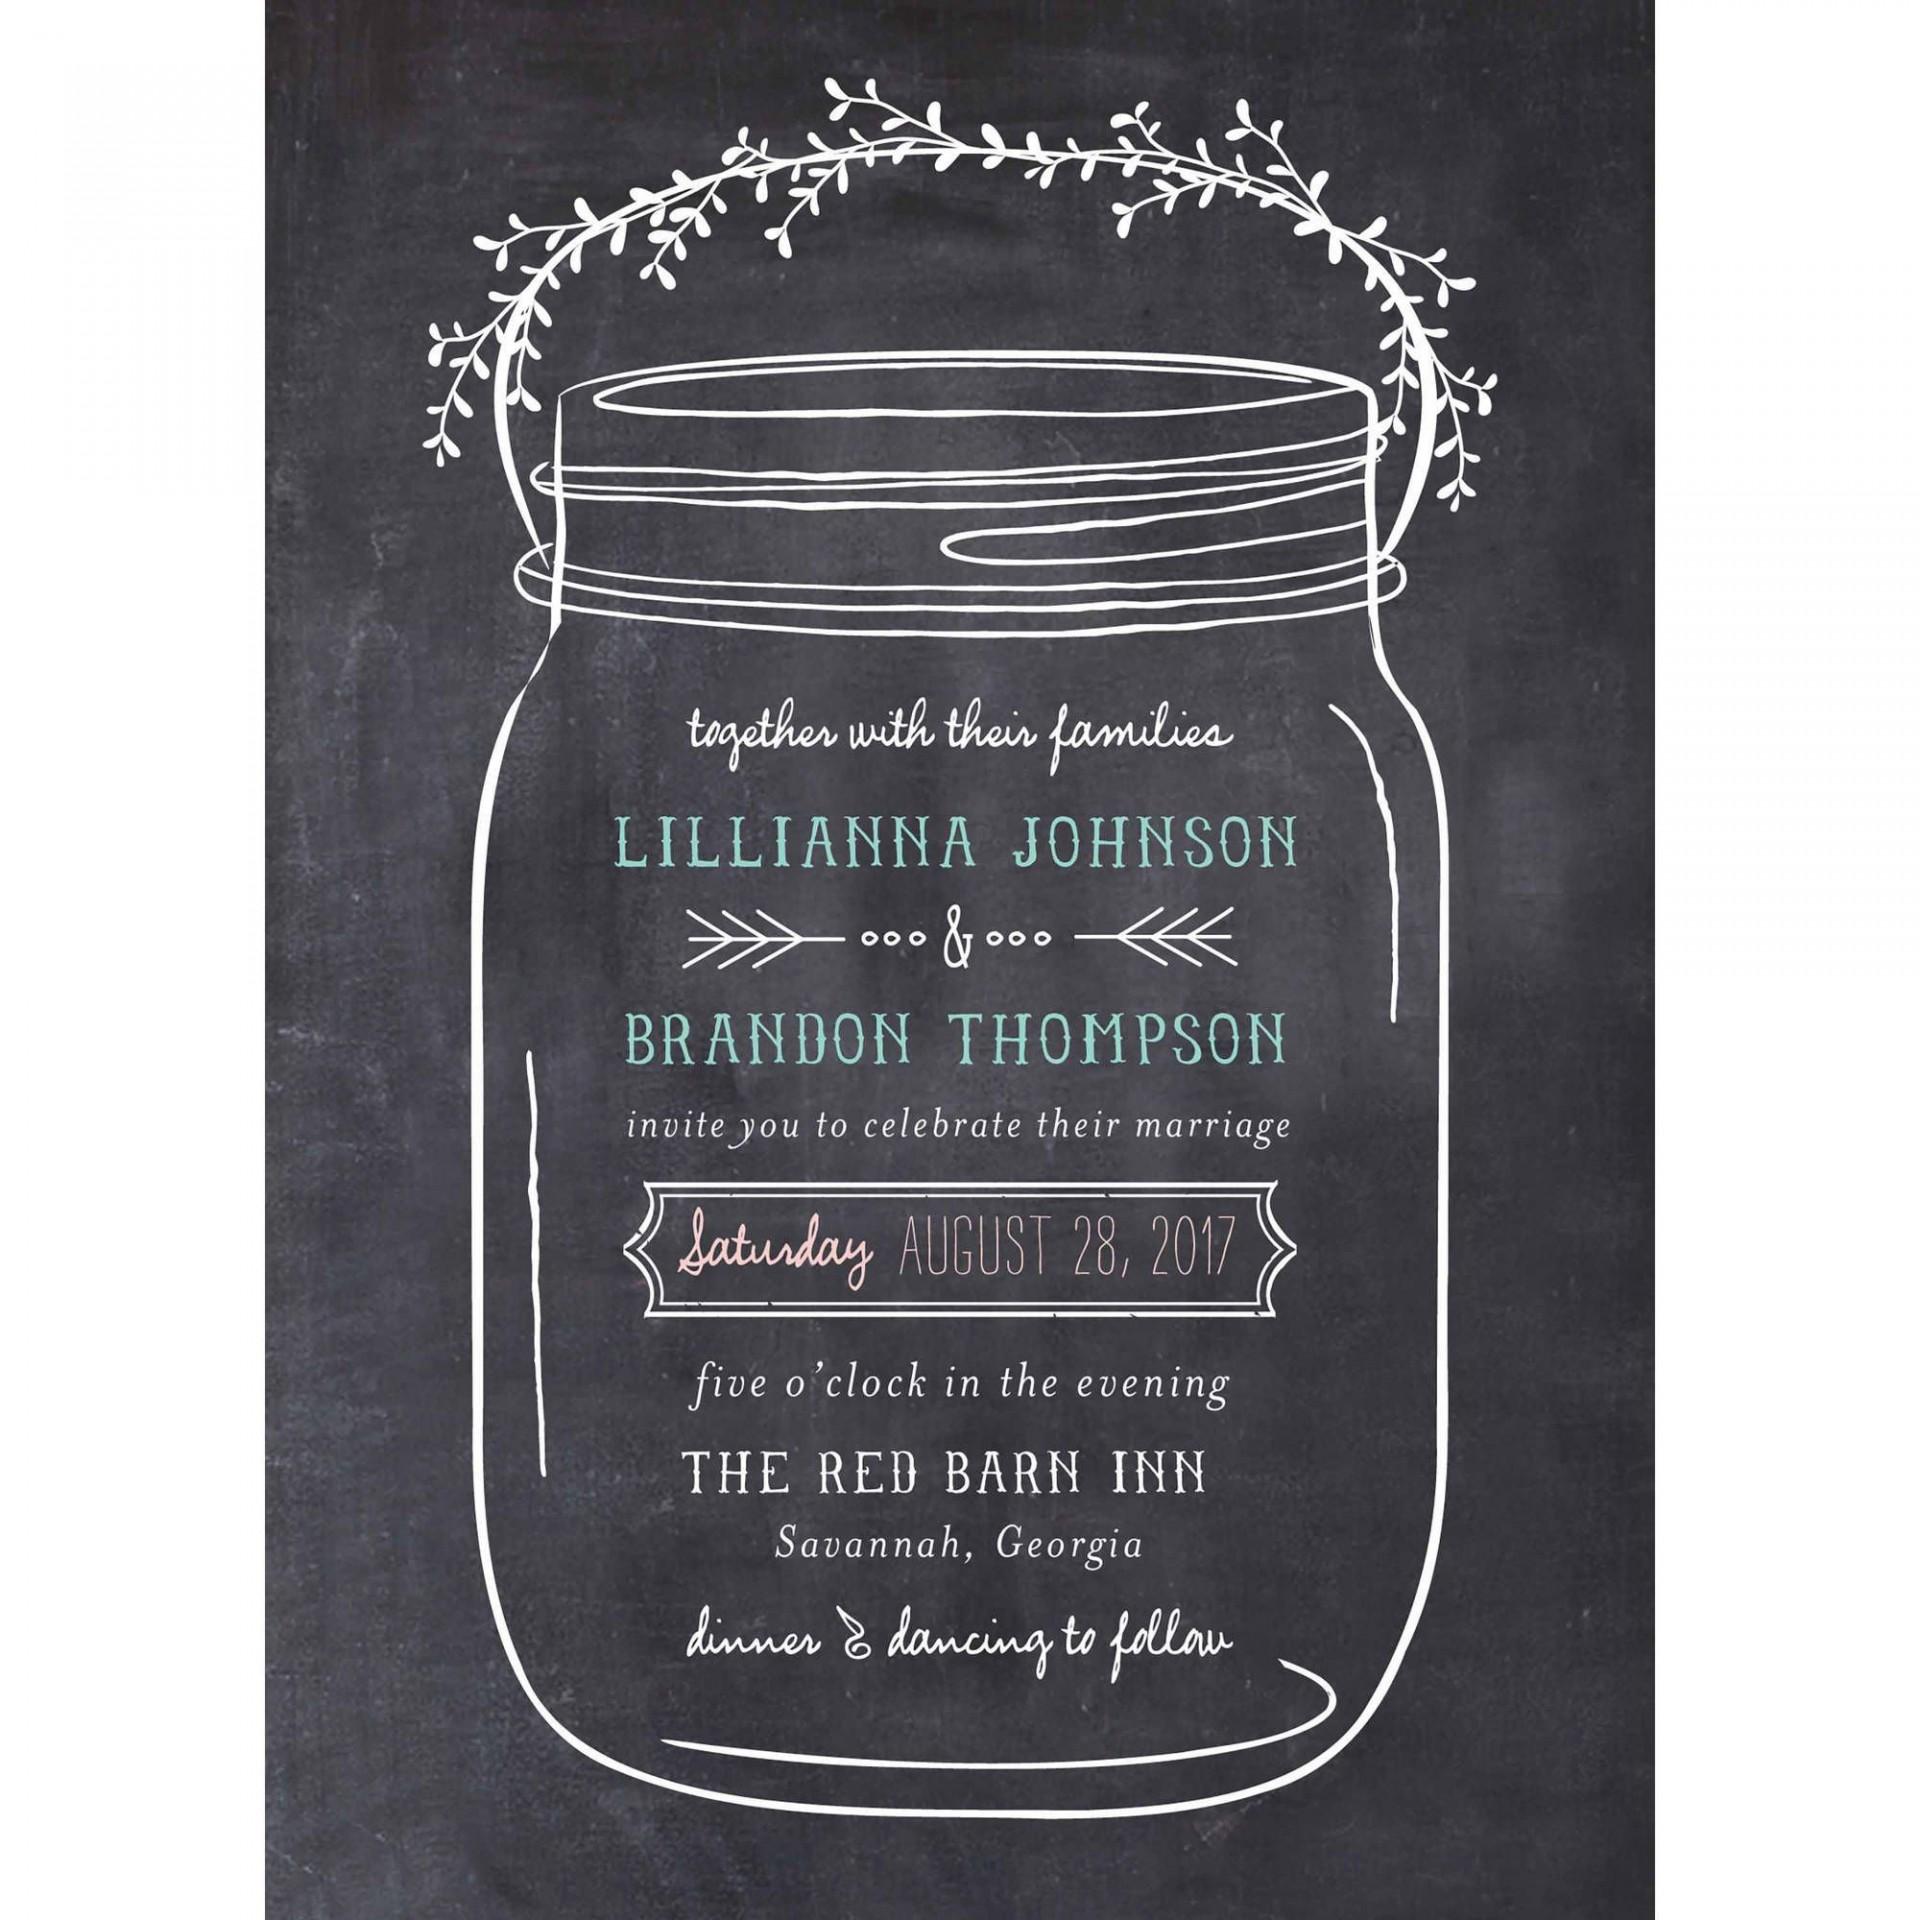 004 Staggering Mason Jar Invitation Template Image  Free Wedding Shower Rustic1920